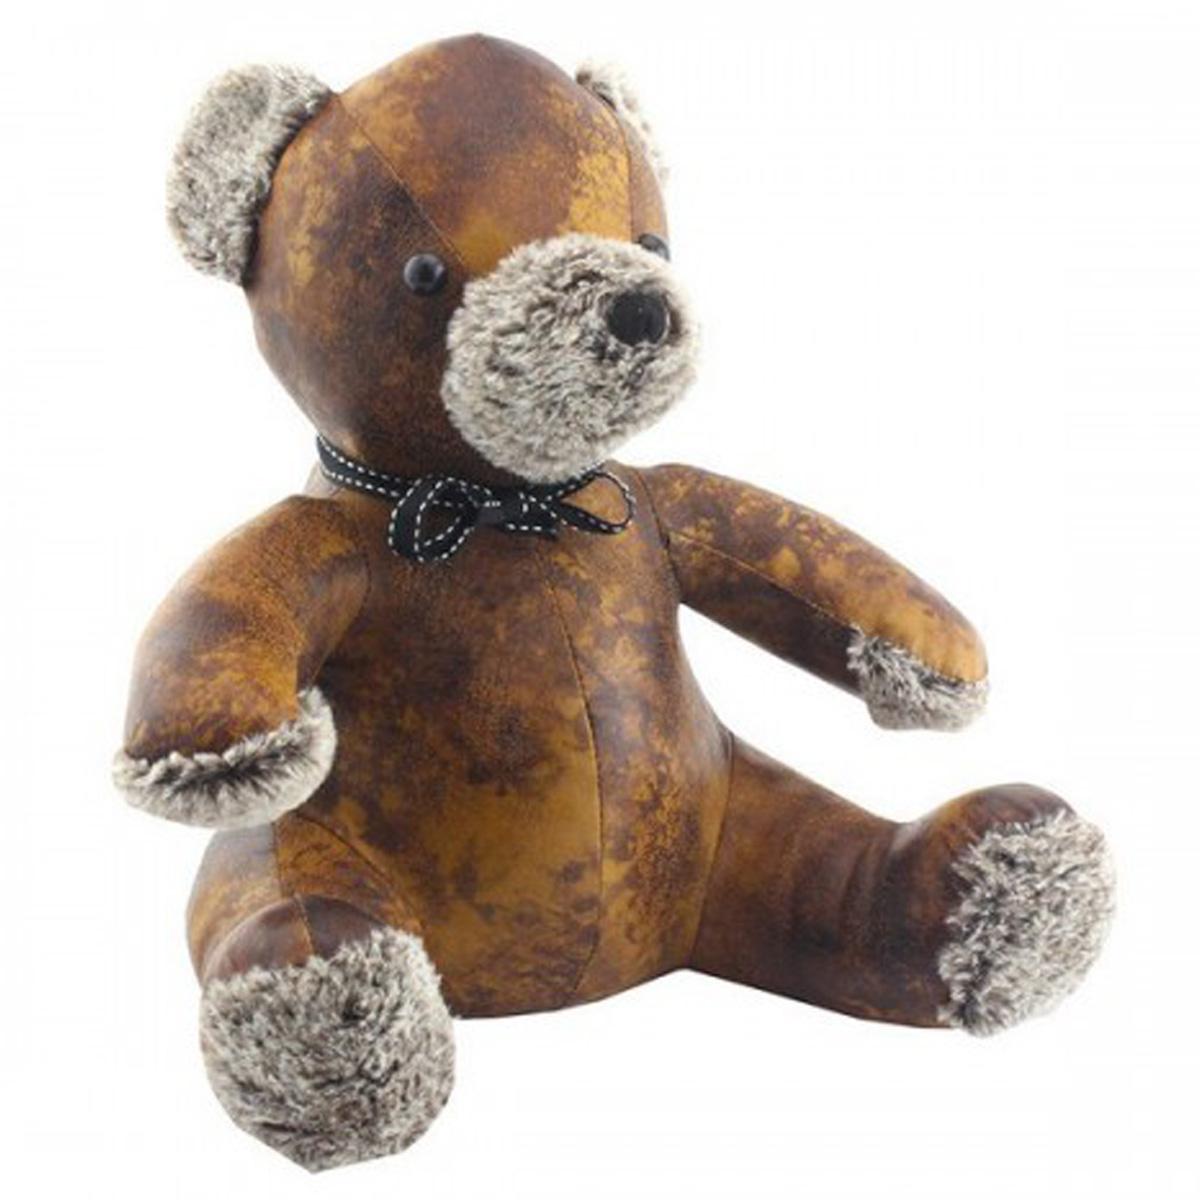 Cale porte façon cuir \'Teddy\' marron - 31x24x22 cm - [Q6482]